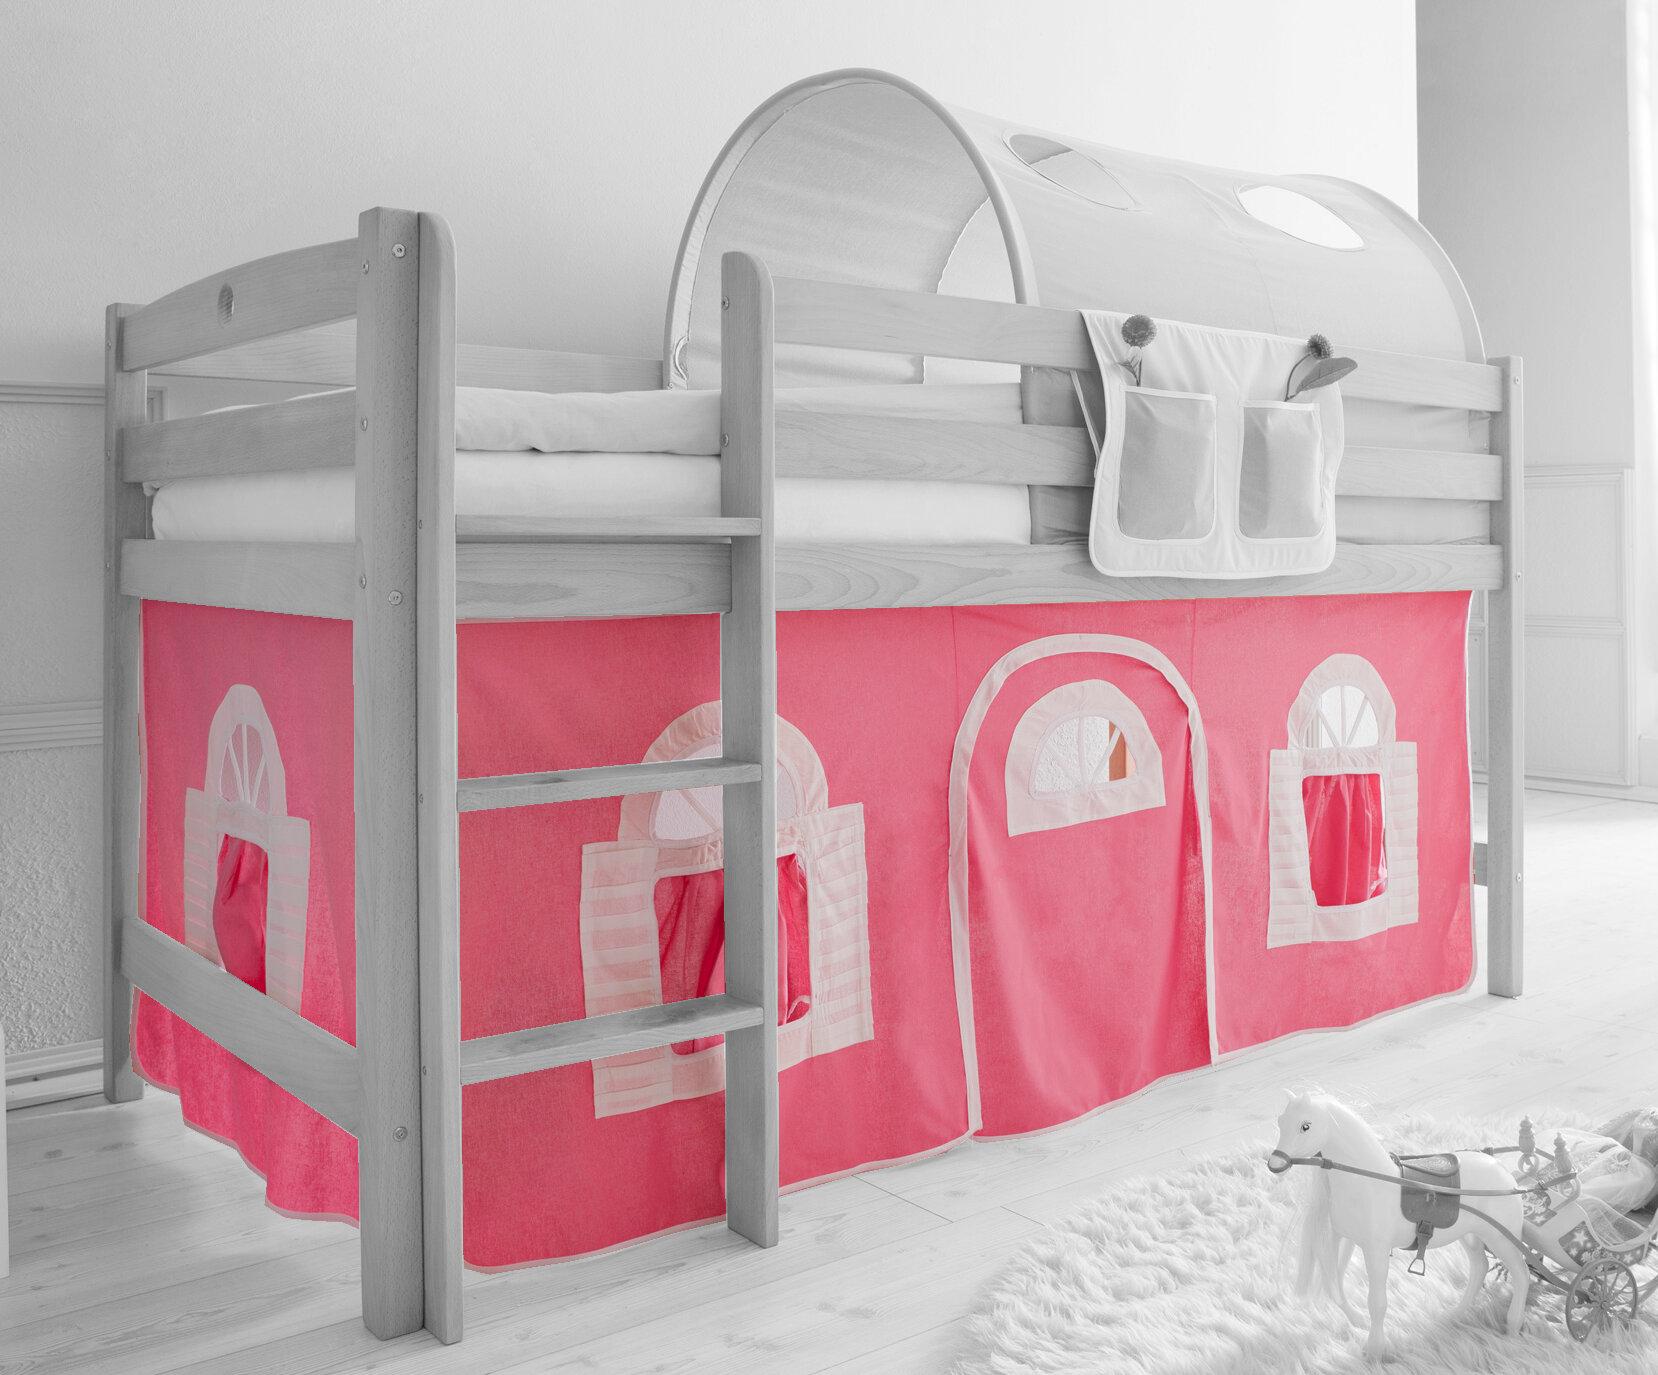 Etagenbett Baby Walz : Ticaa hochbett vorhang u2013 zuhause image idee